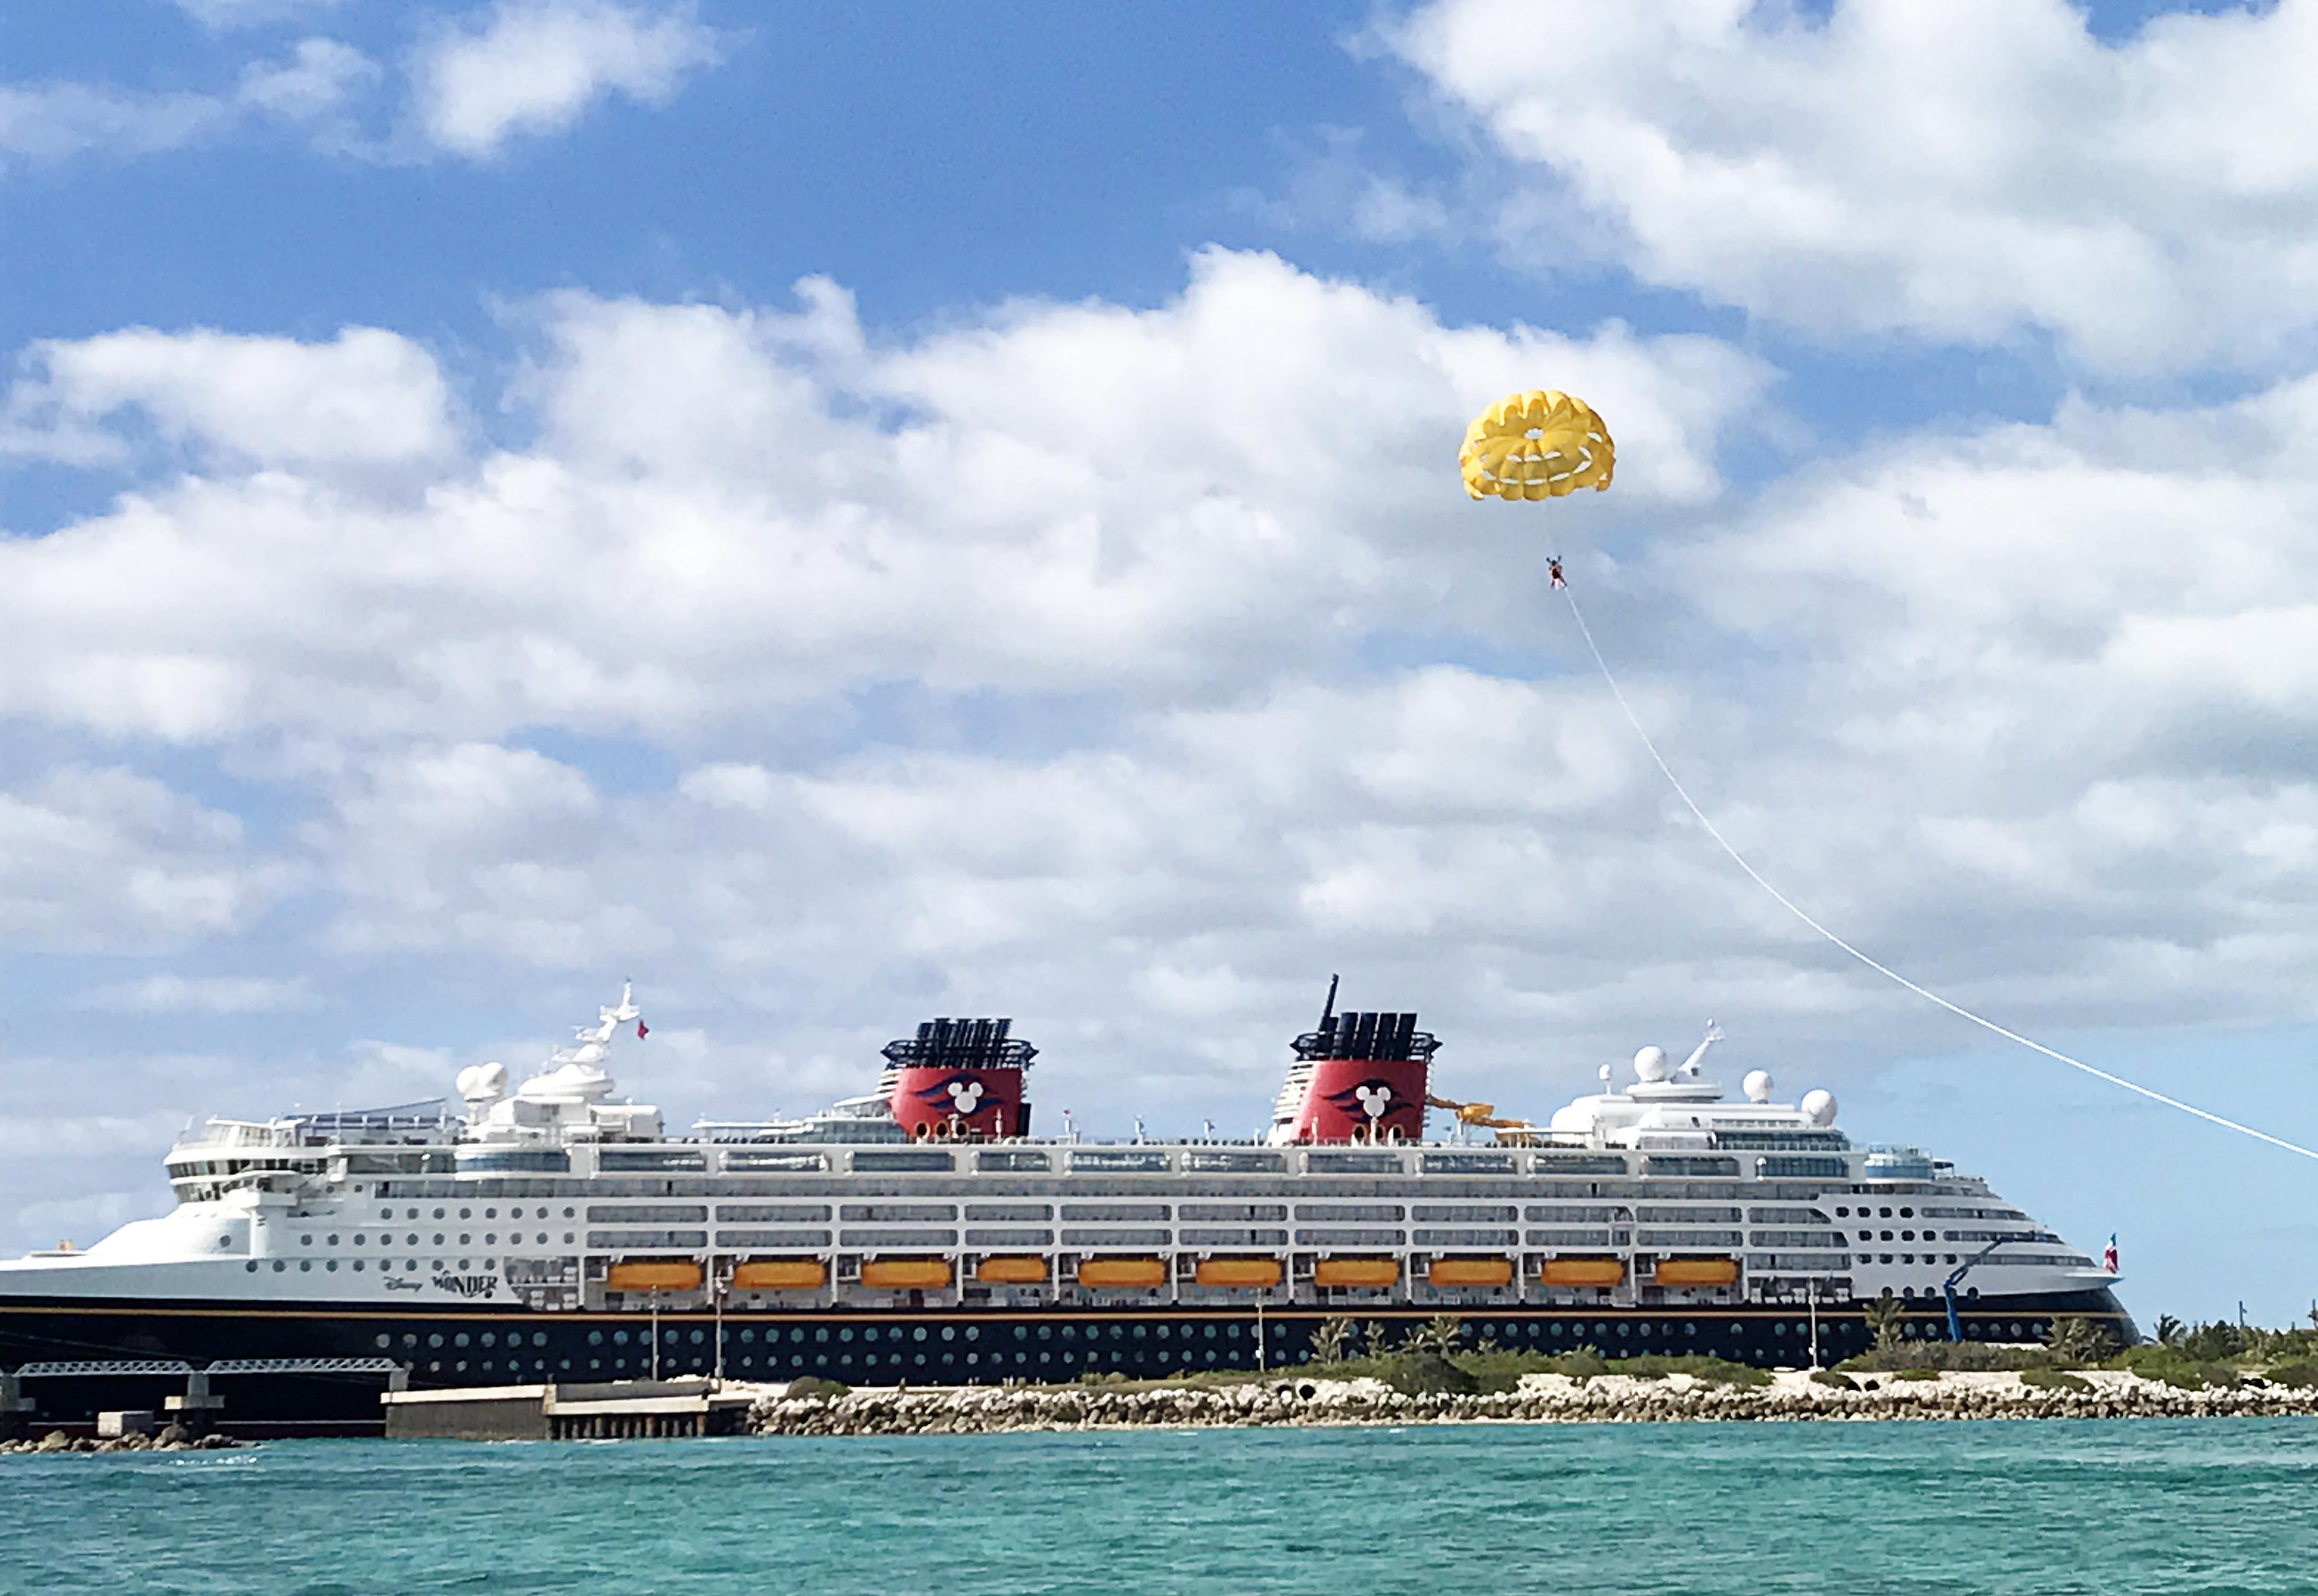 Disney Ships | Disney Cruise Line® |Castaway Cay Disney Cruise Line